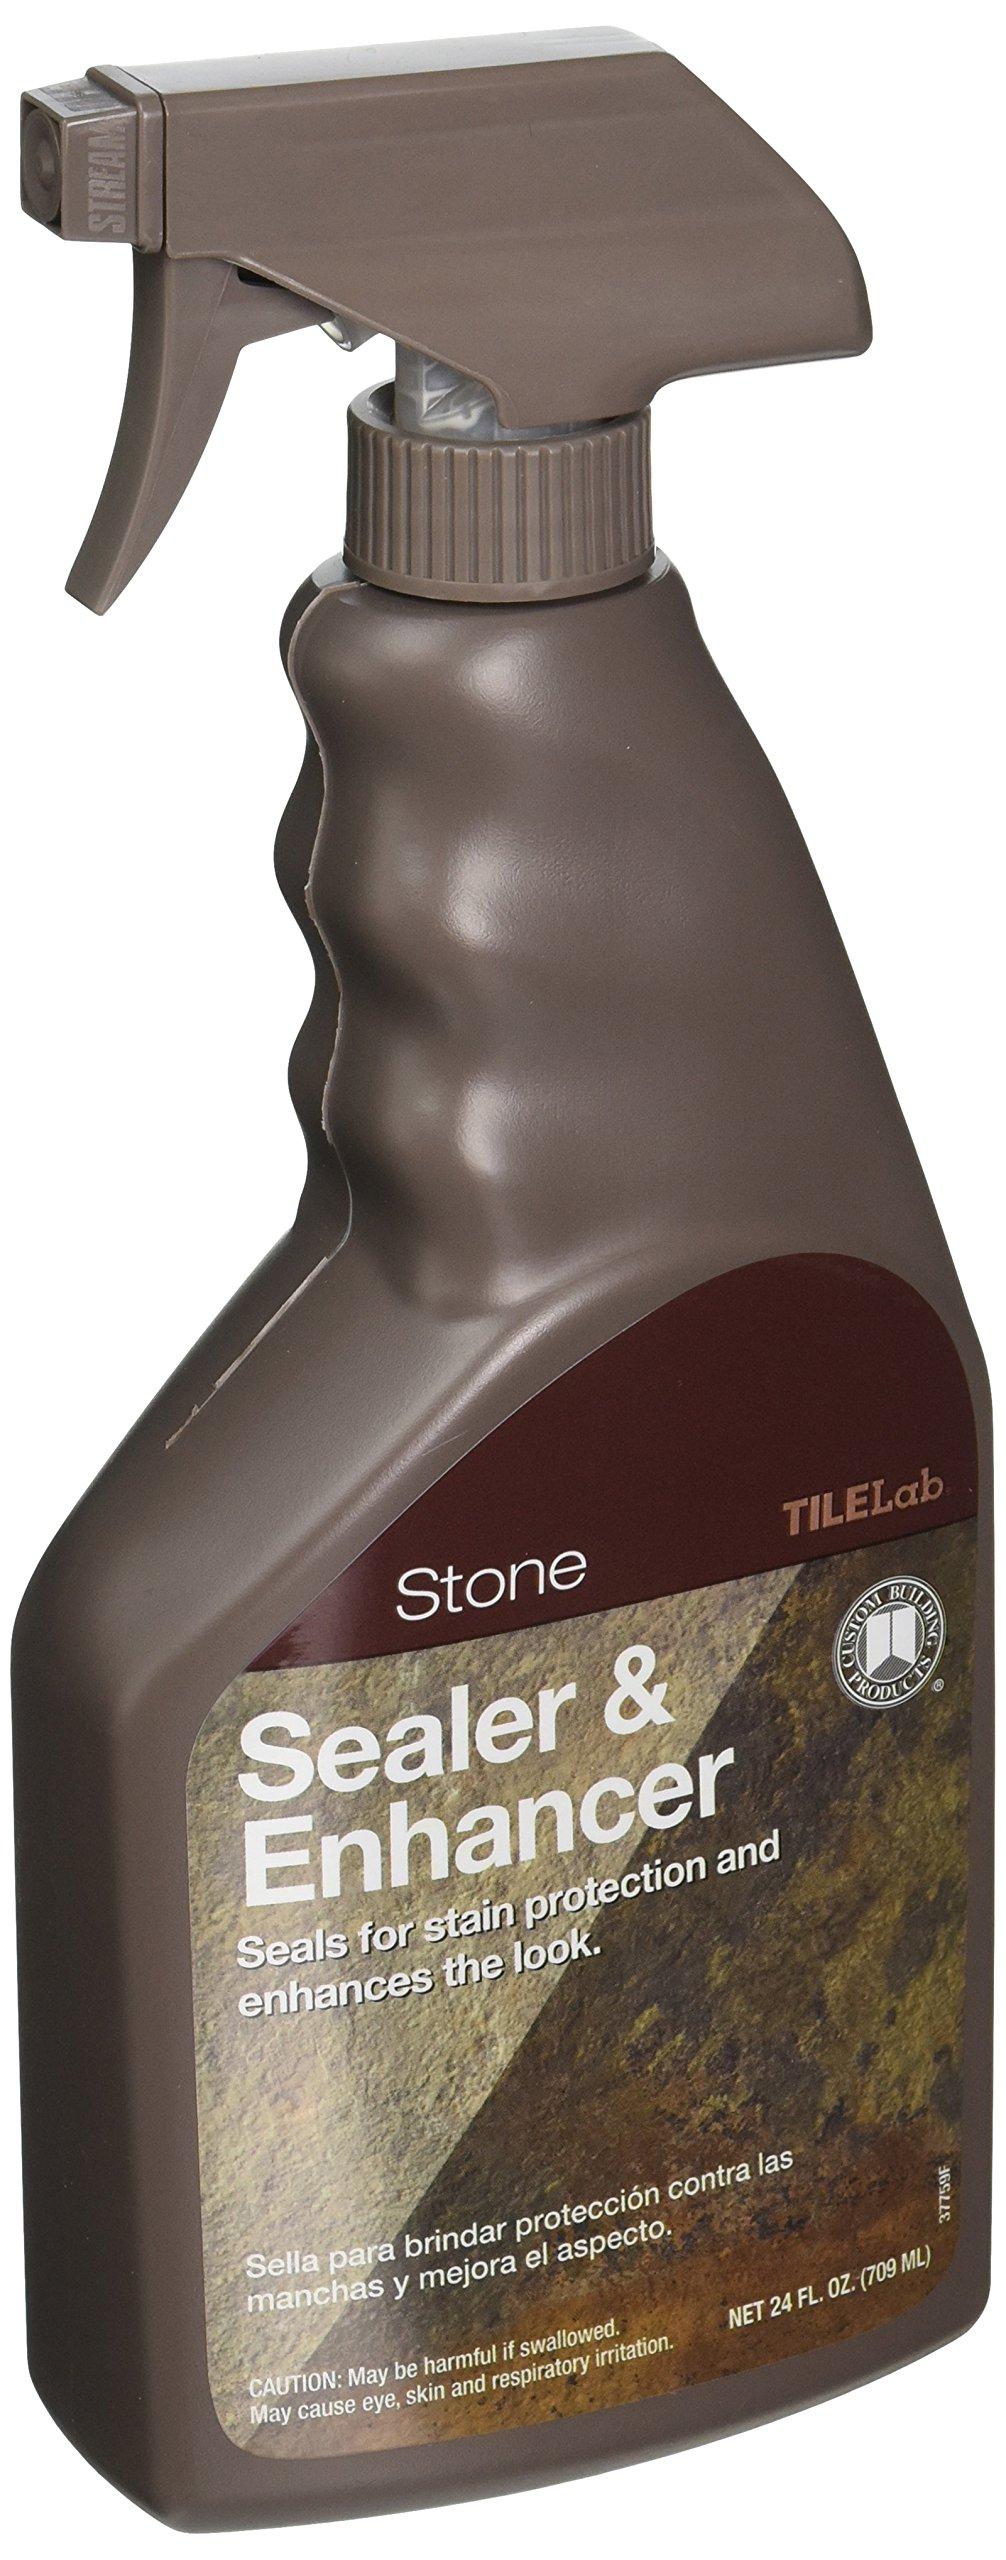 Custom BLDG Products TLSES24Z Tile lab StoneSealerandEnhancer, 24 Oz, Spray Bottle, Milky, Characteristic, Liquid, Clear by Custom Building Products